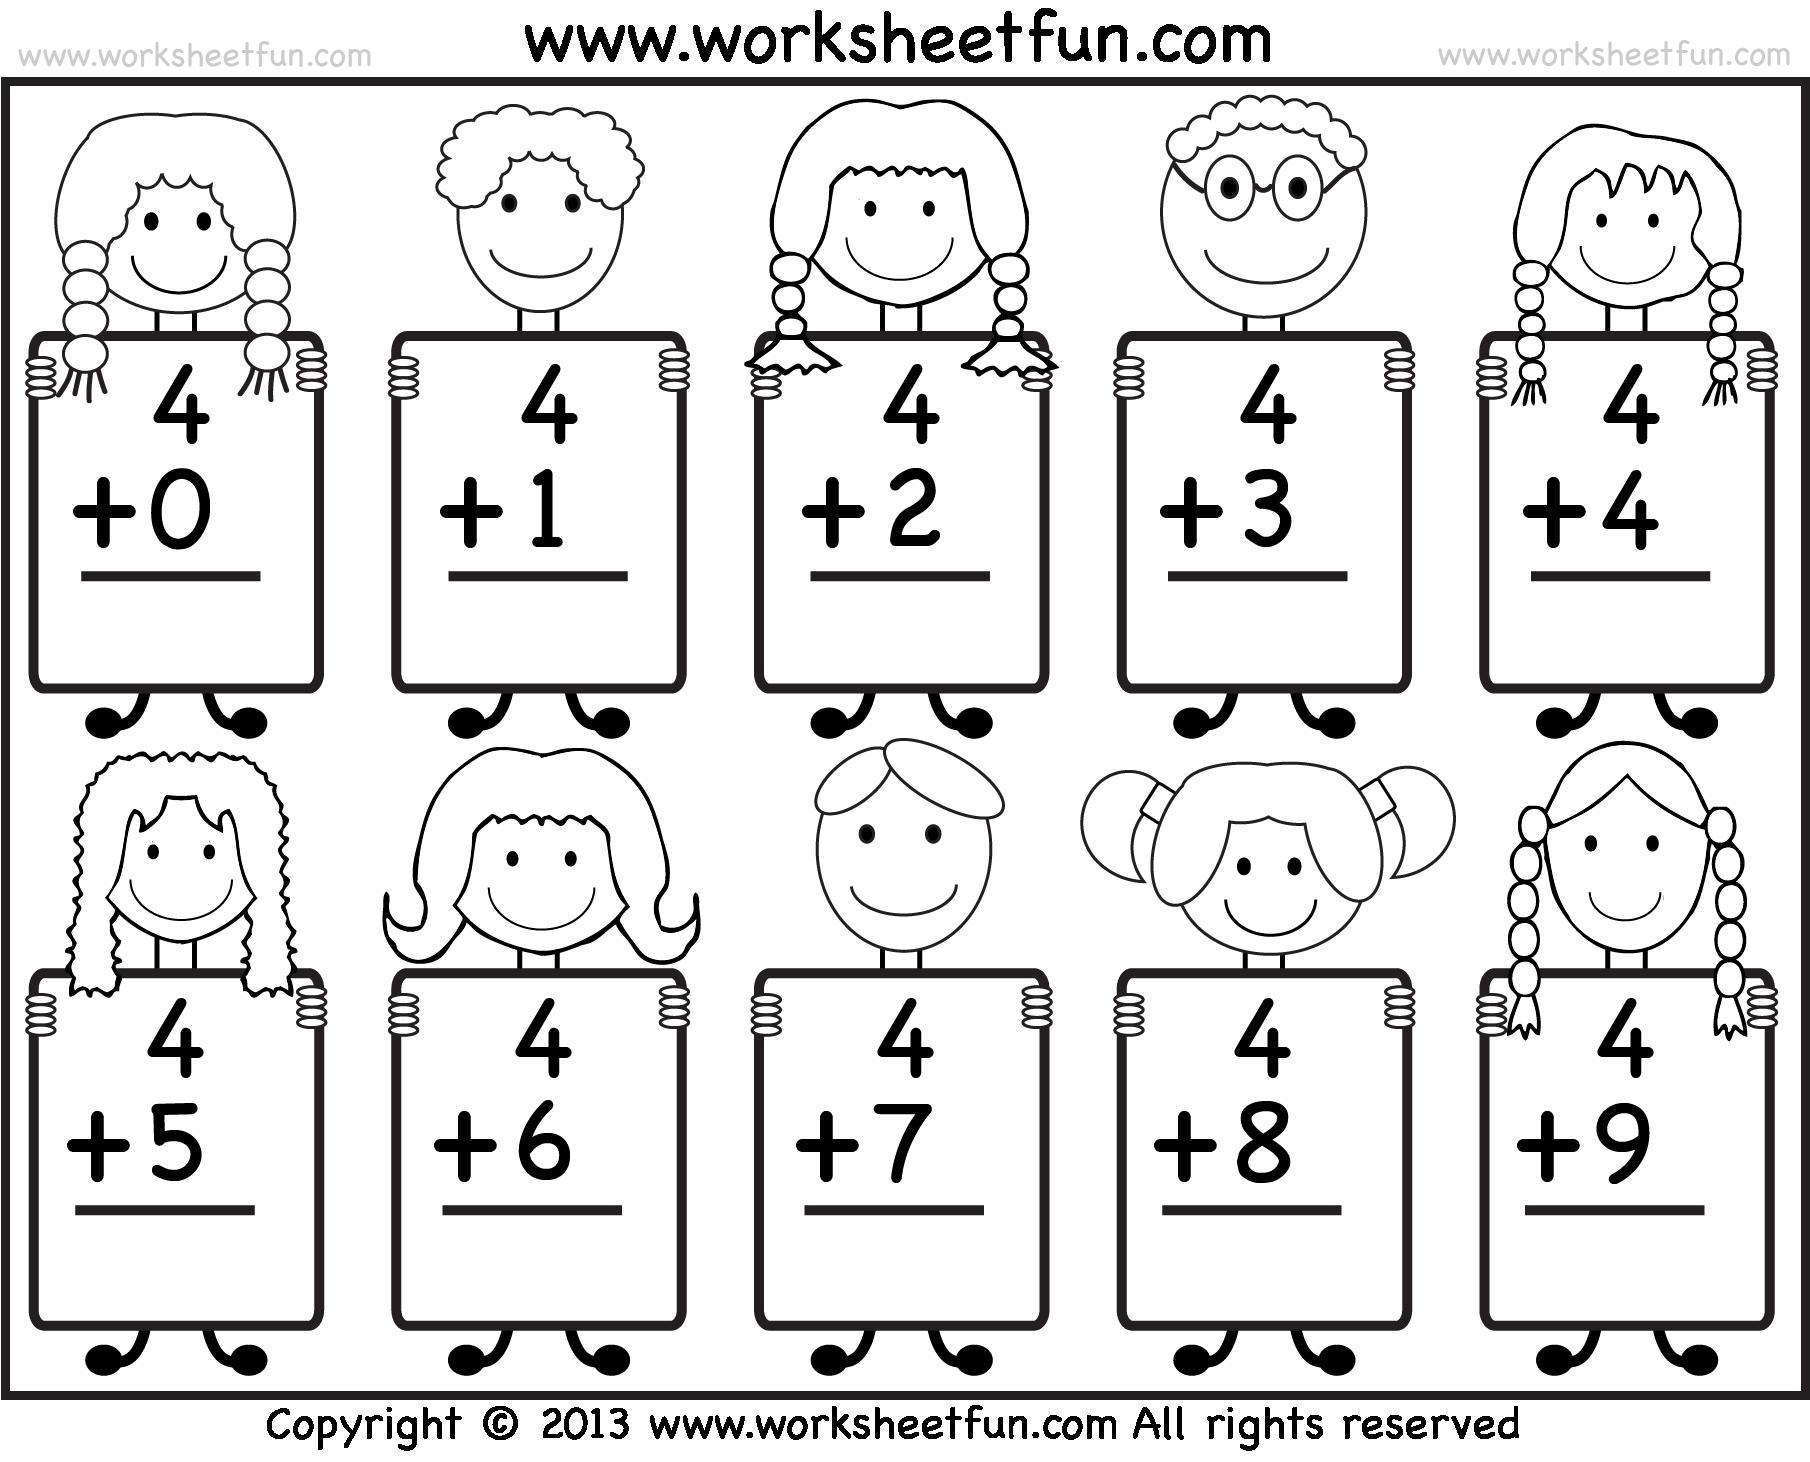 Kindergarten Math Png Black And White Transparent Kindergarten Math - Free Printable Math Worksheets For Kindergarten